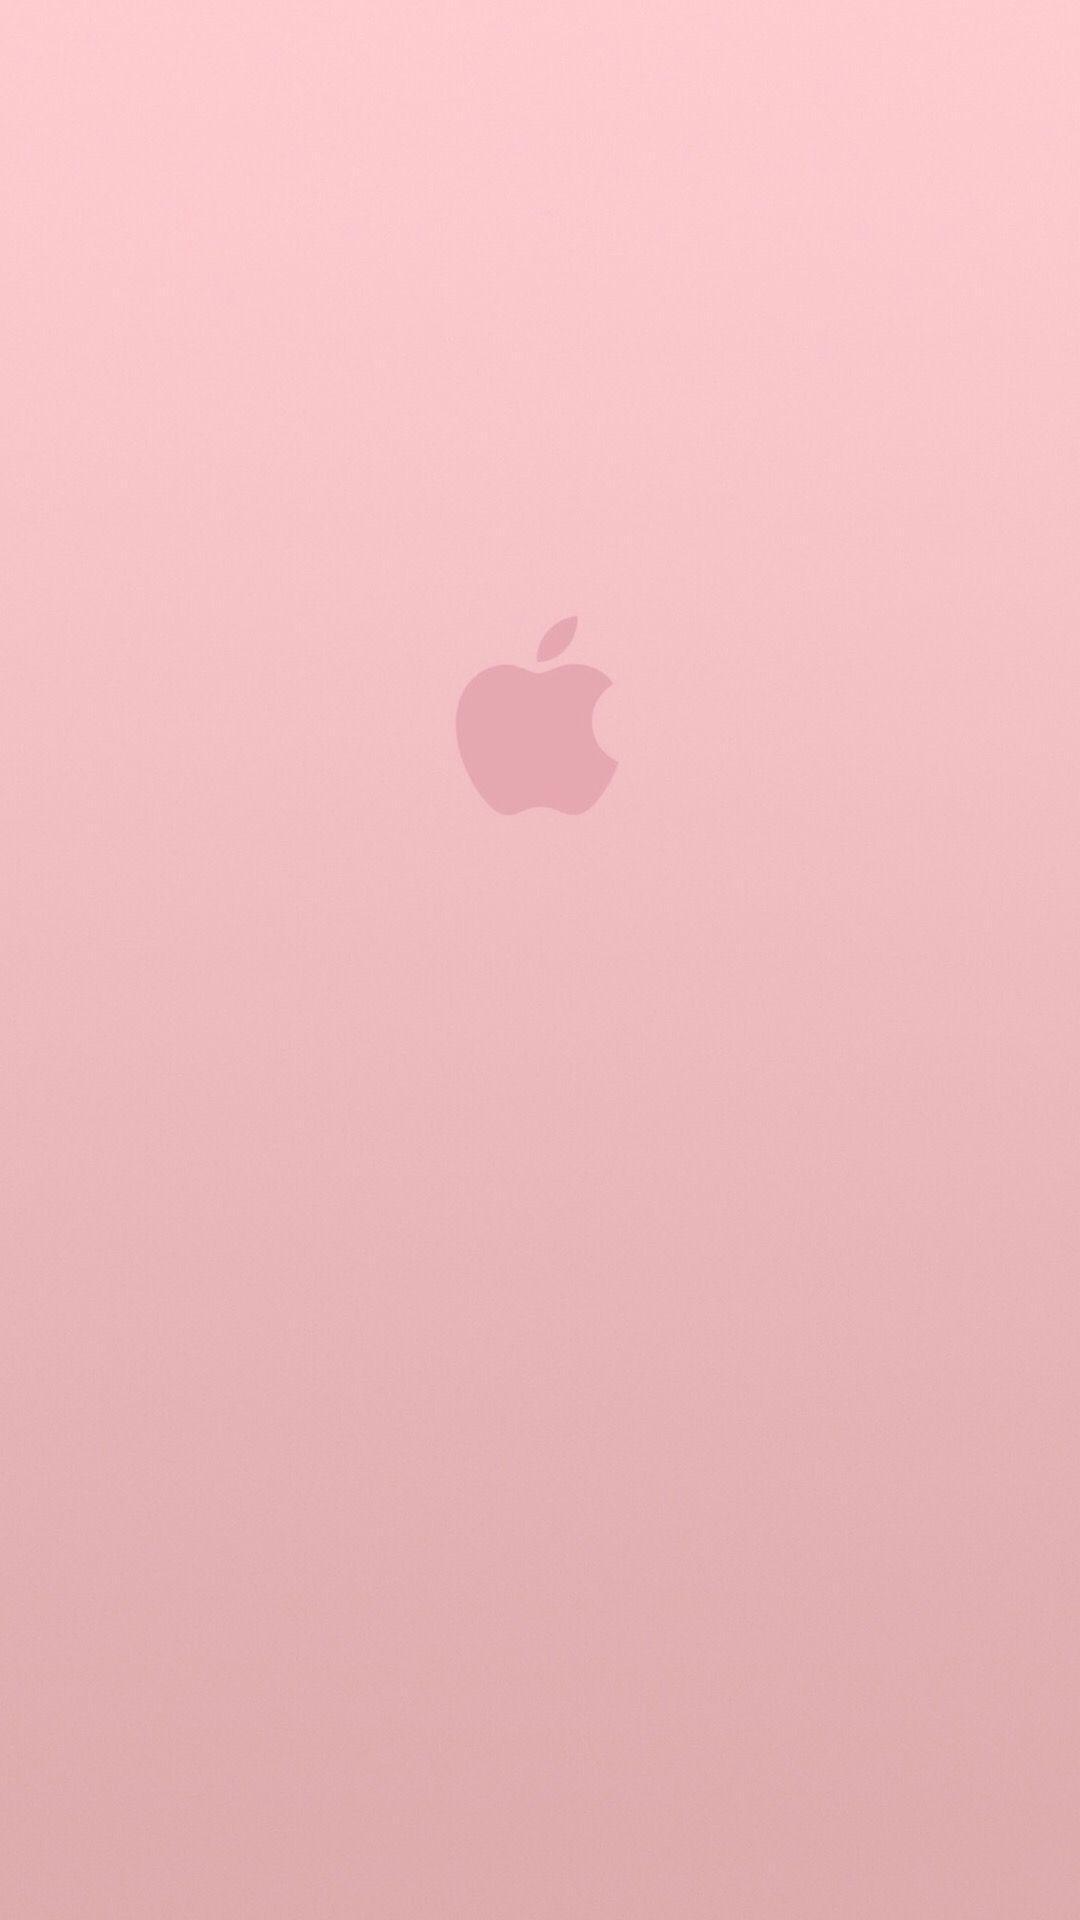 Pink Apple Logo Wallpapers - Top Free ...